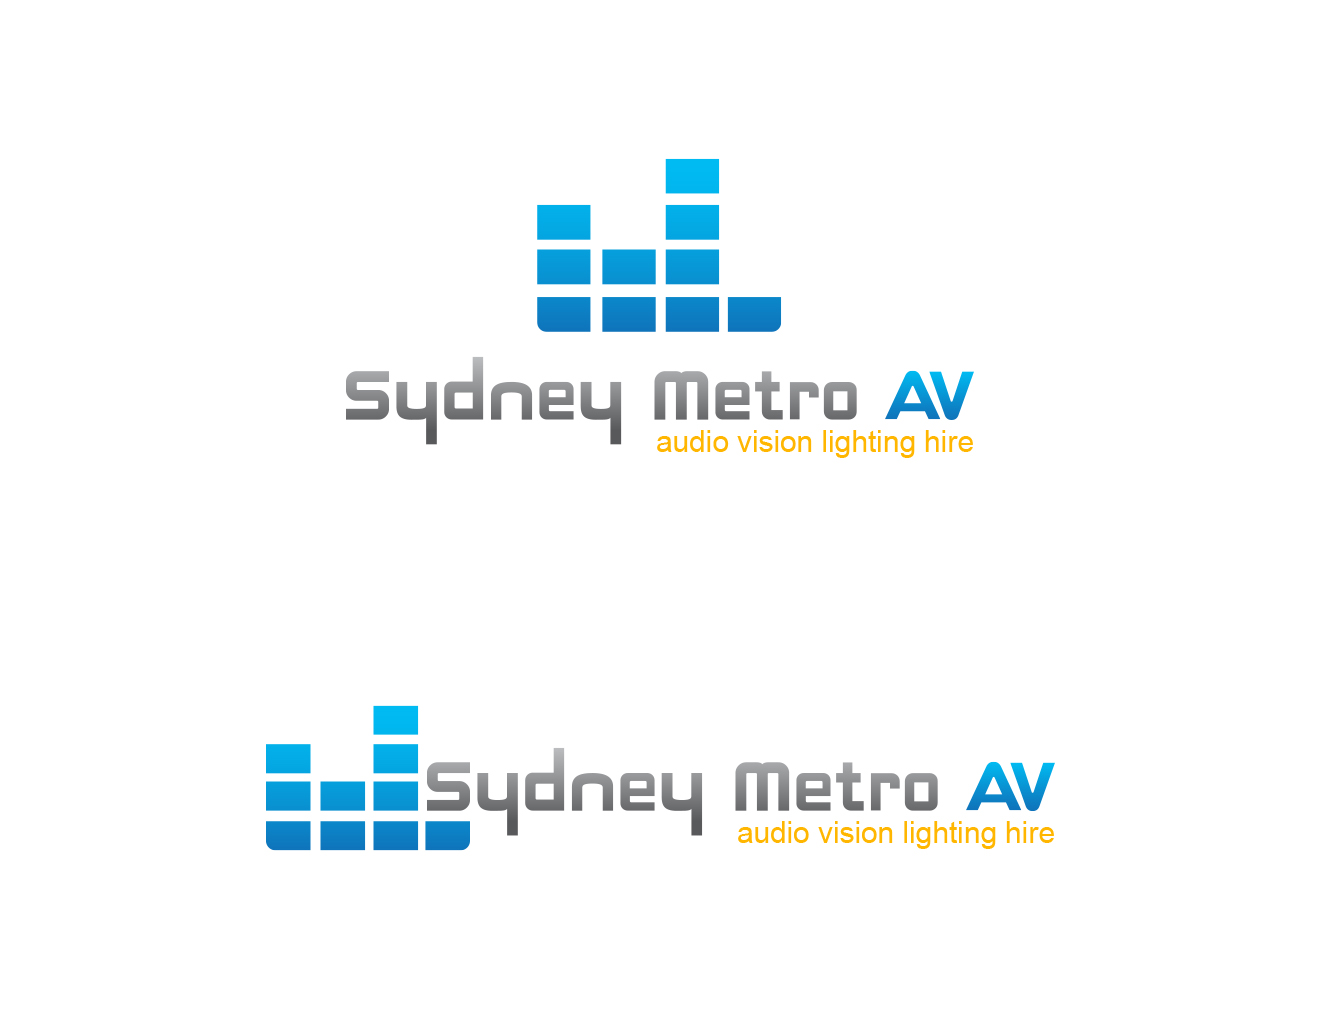 It Company Logo Design for Sydney Metro AV audio visual lighting